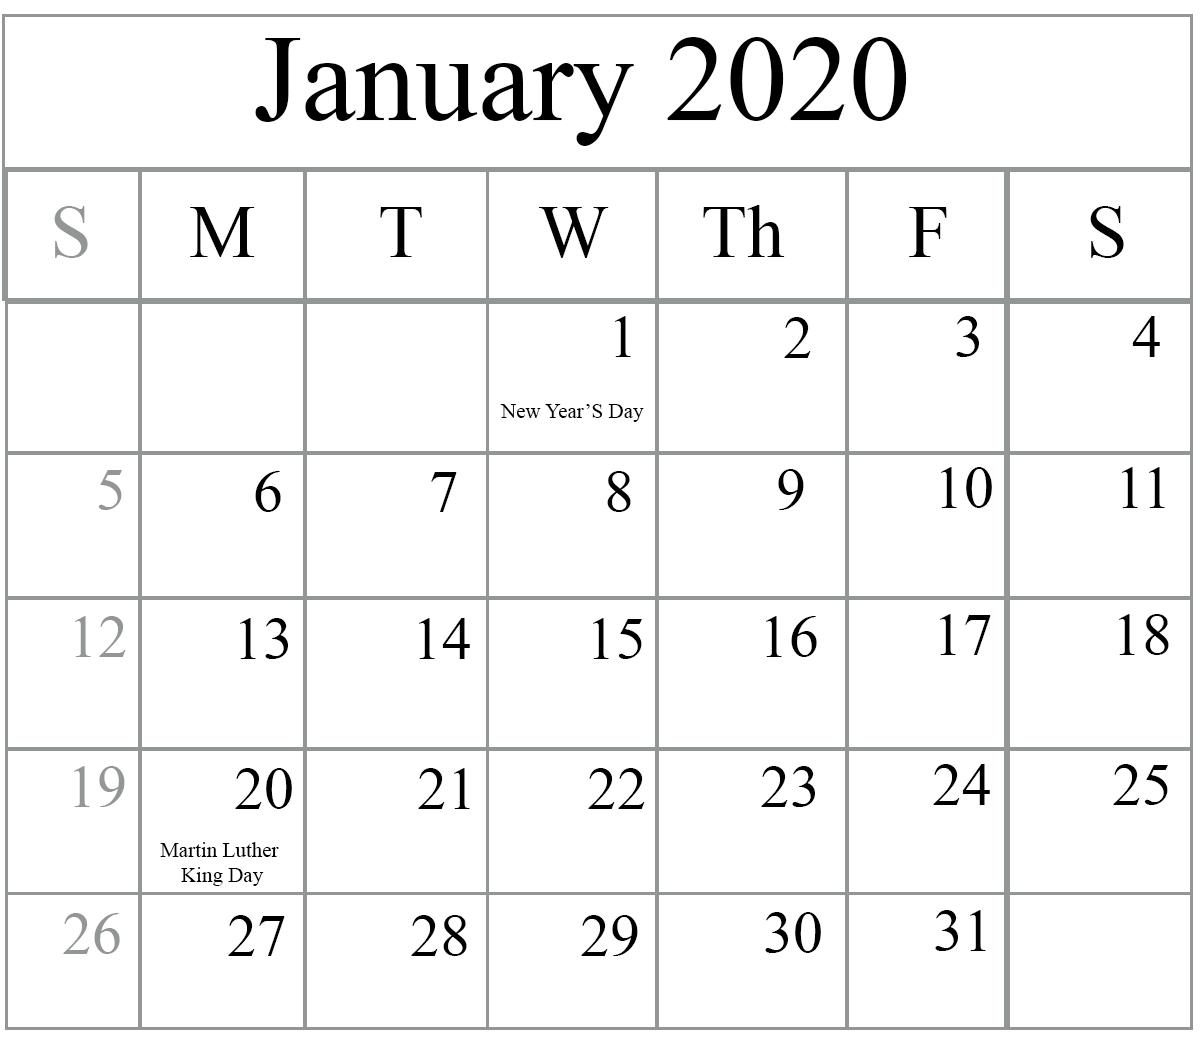 Free January 2020 Printable Calendar In Pdf, Excel & Word